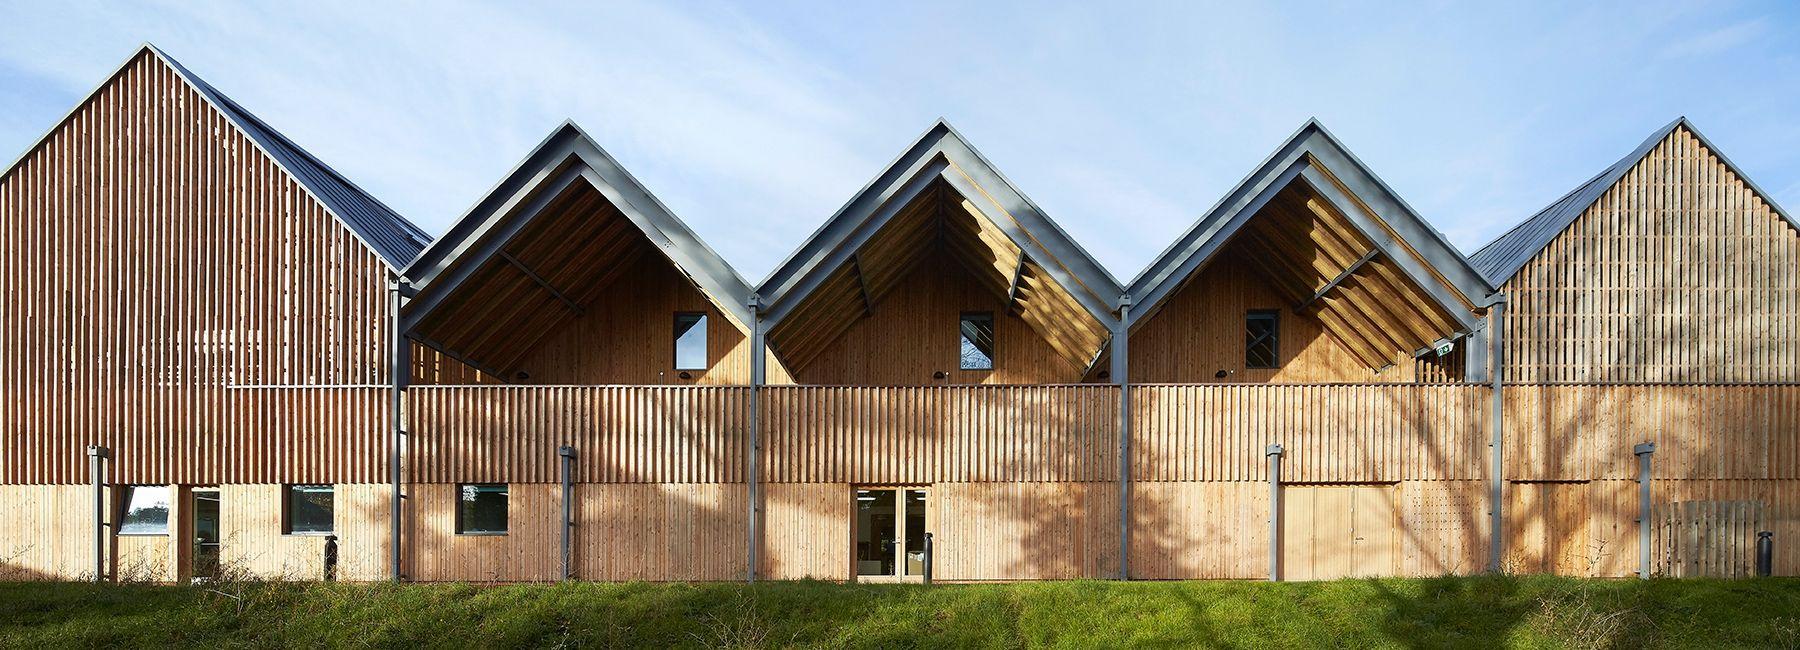 Feilden Clegg Bradley Creates Sunlit Studios For Art And Design School School Architecture Architecture Art School